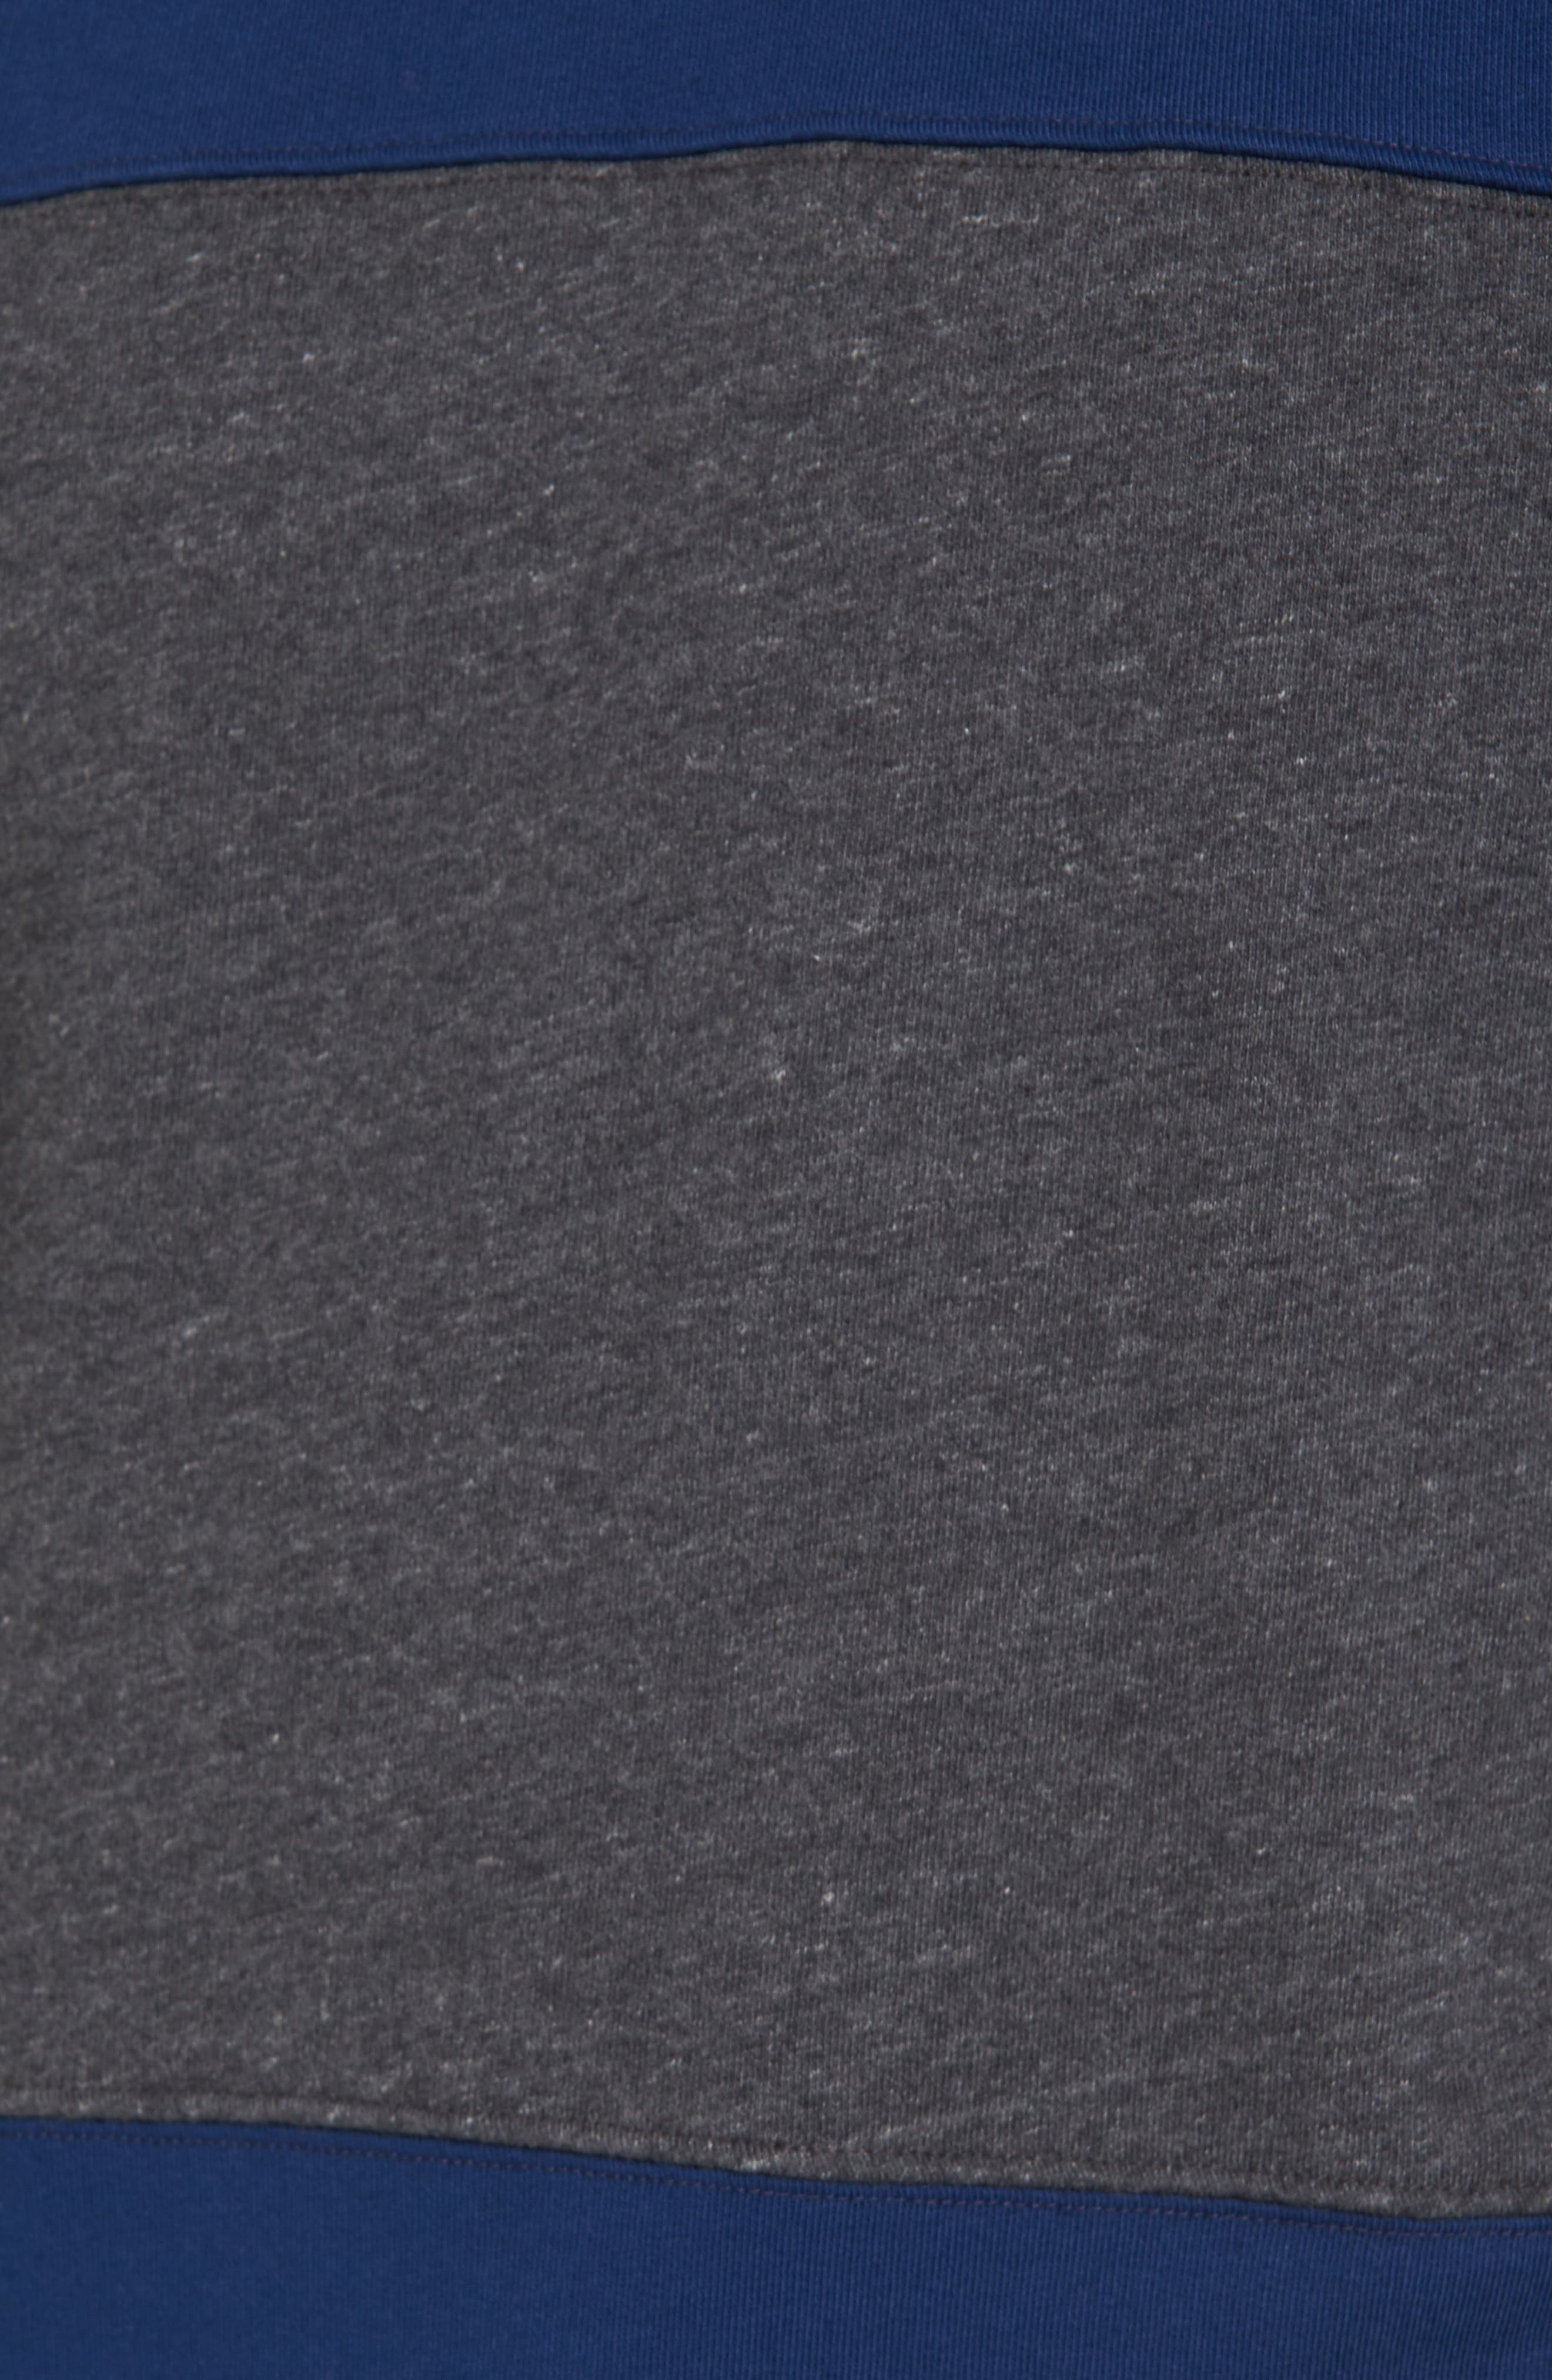 Tipped Colorblock Sweatshirt,                             Alternate thumbnail 5, color,                             401